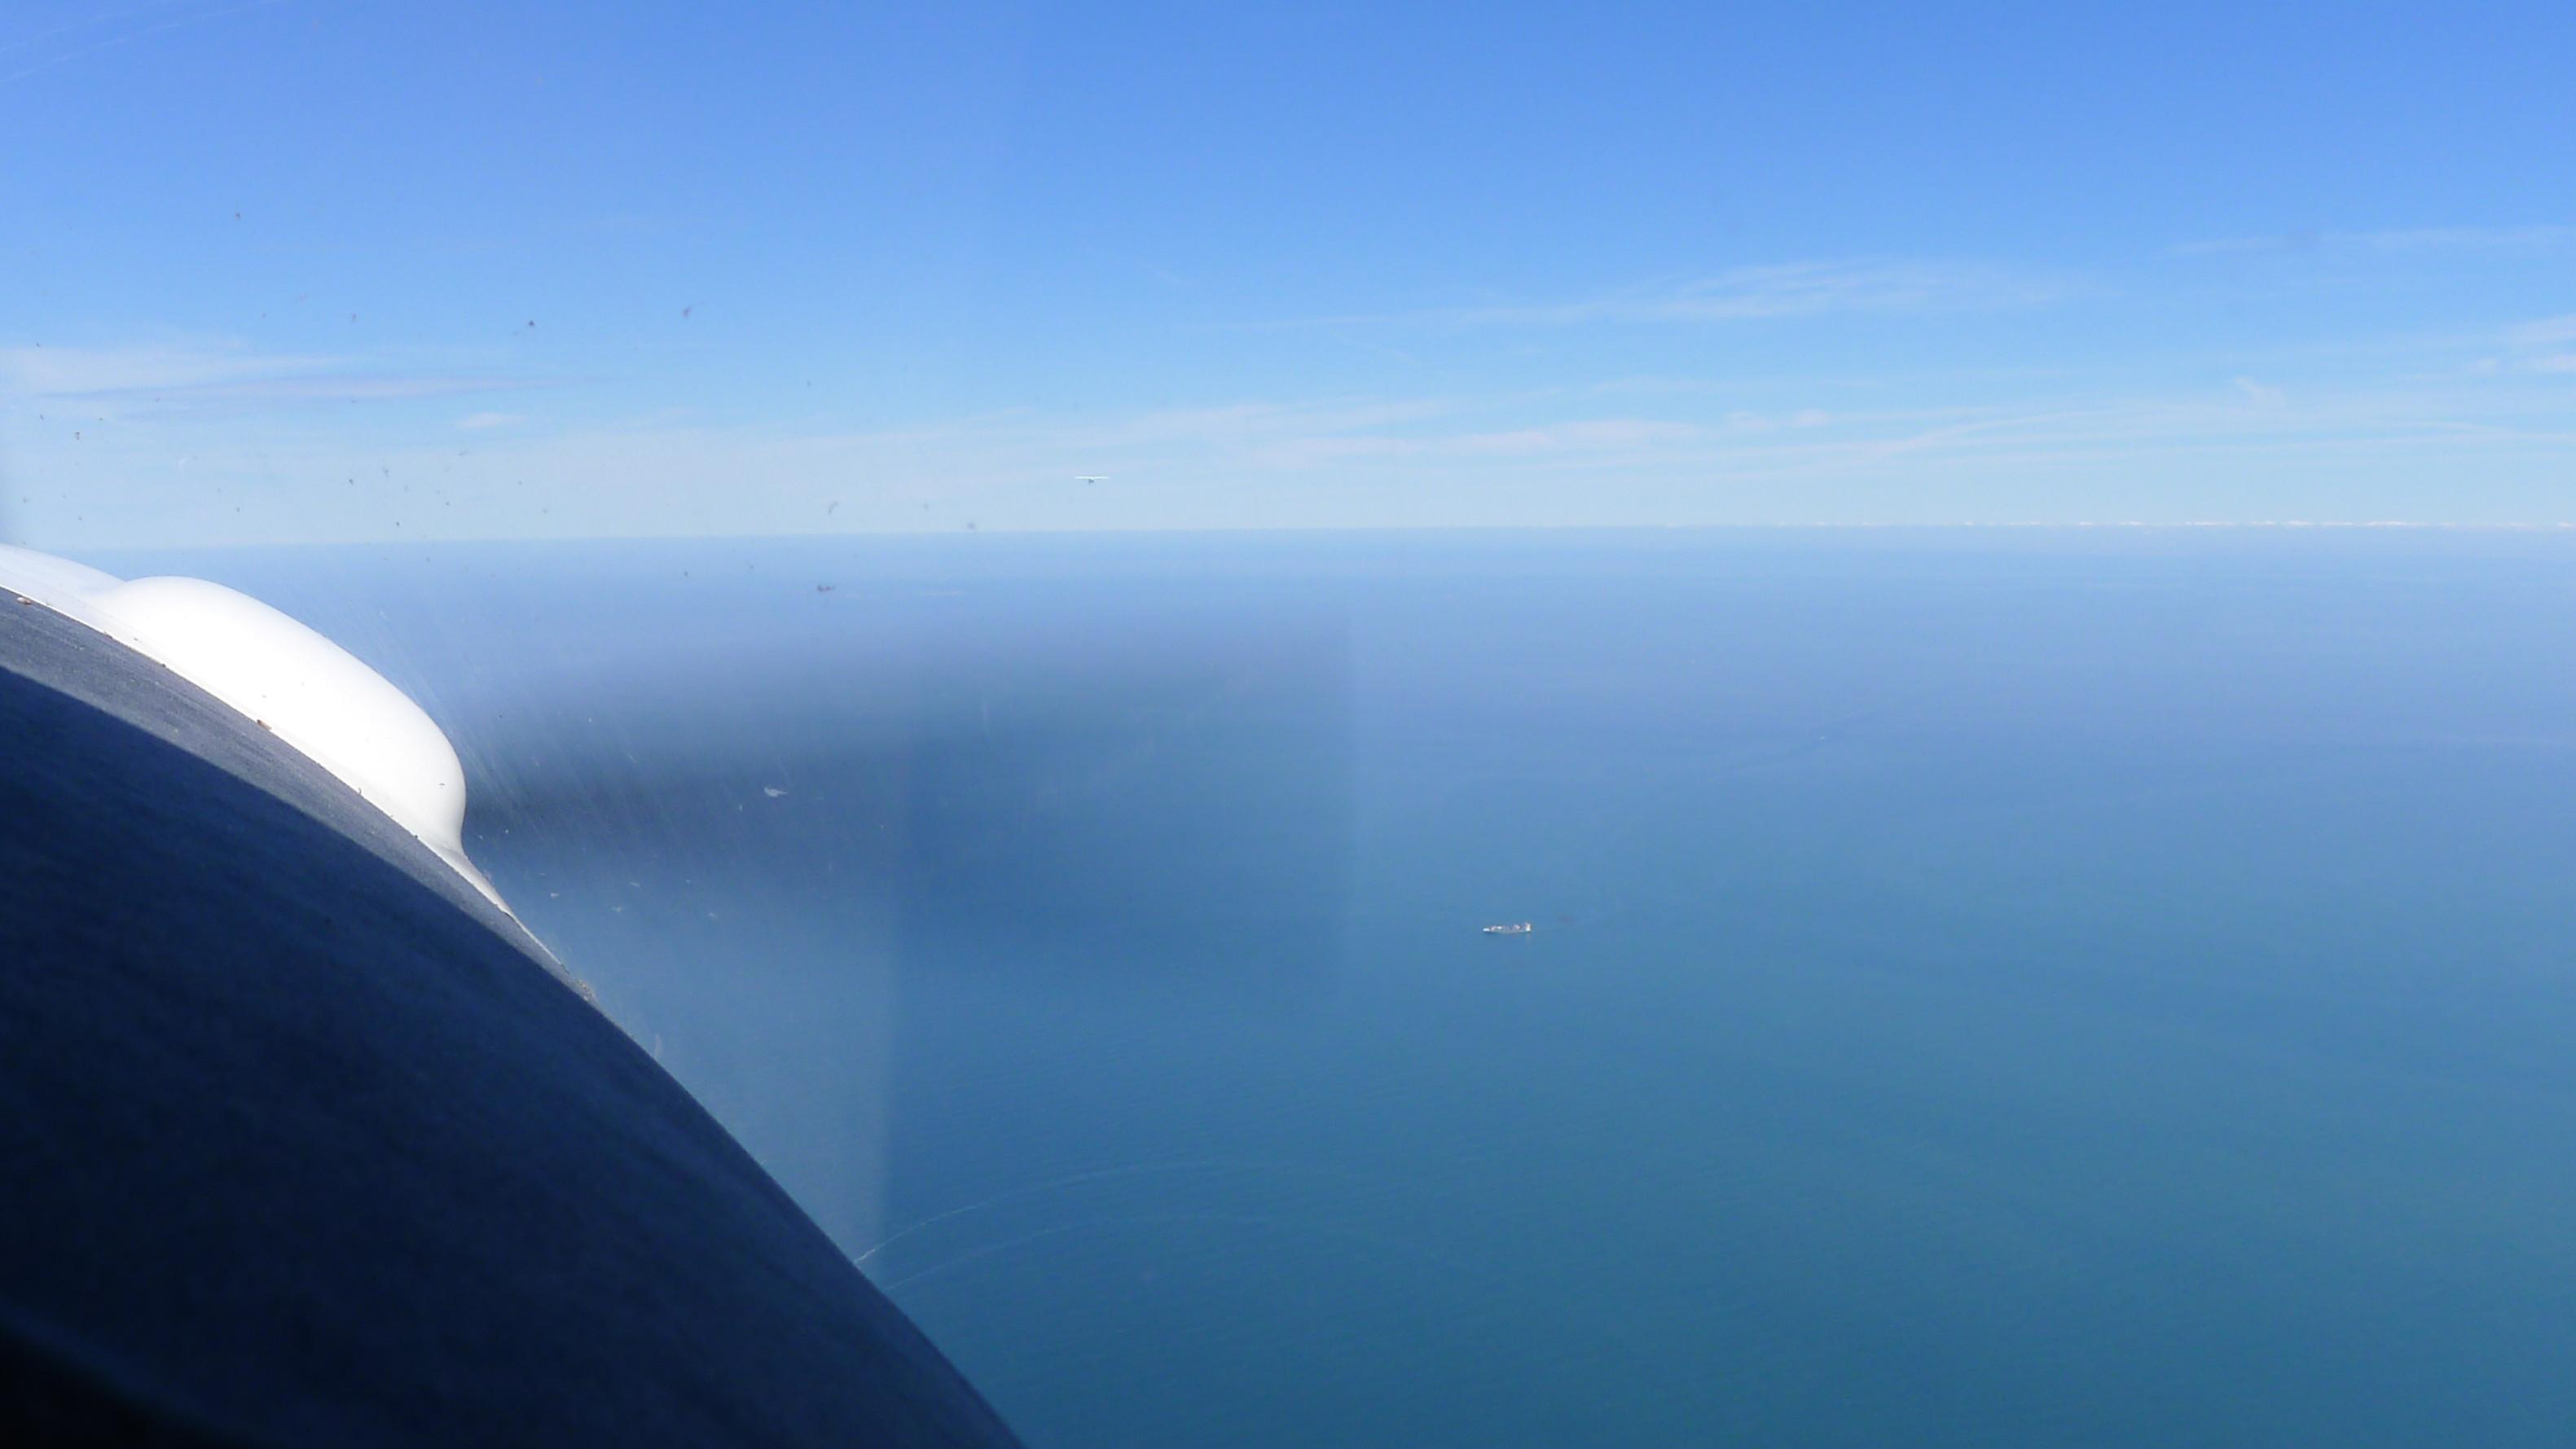 Flug über die Nordsee © Maja Christ